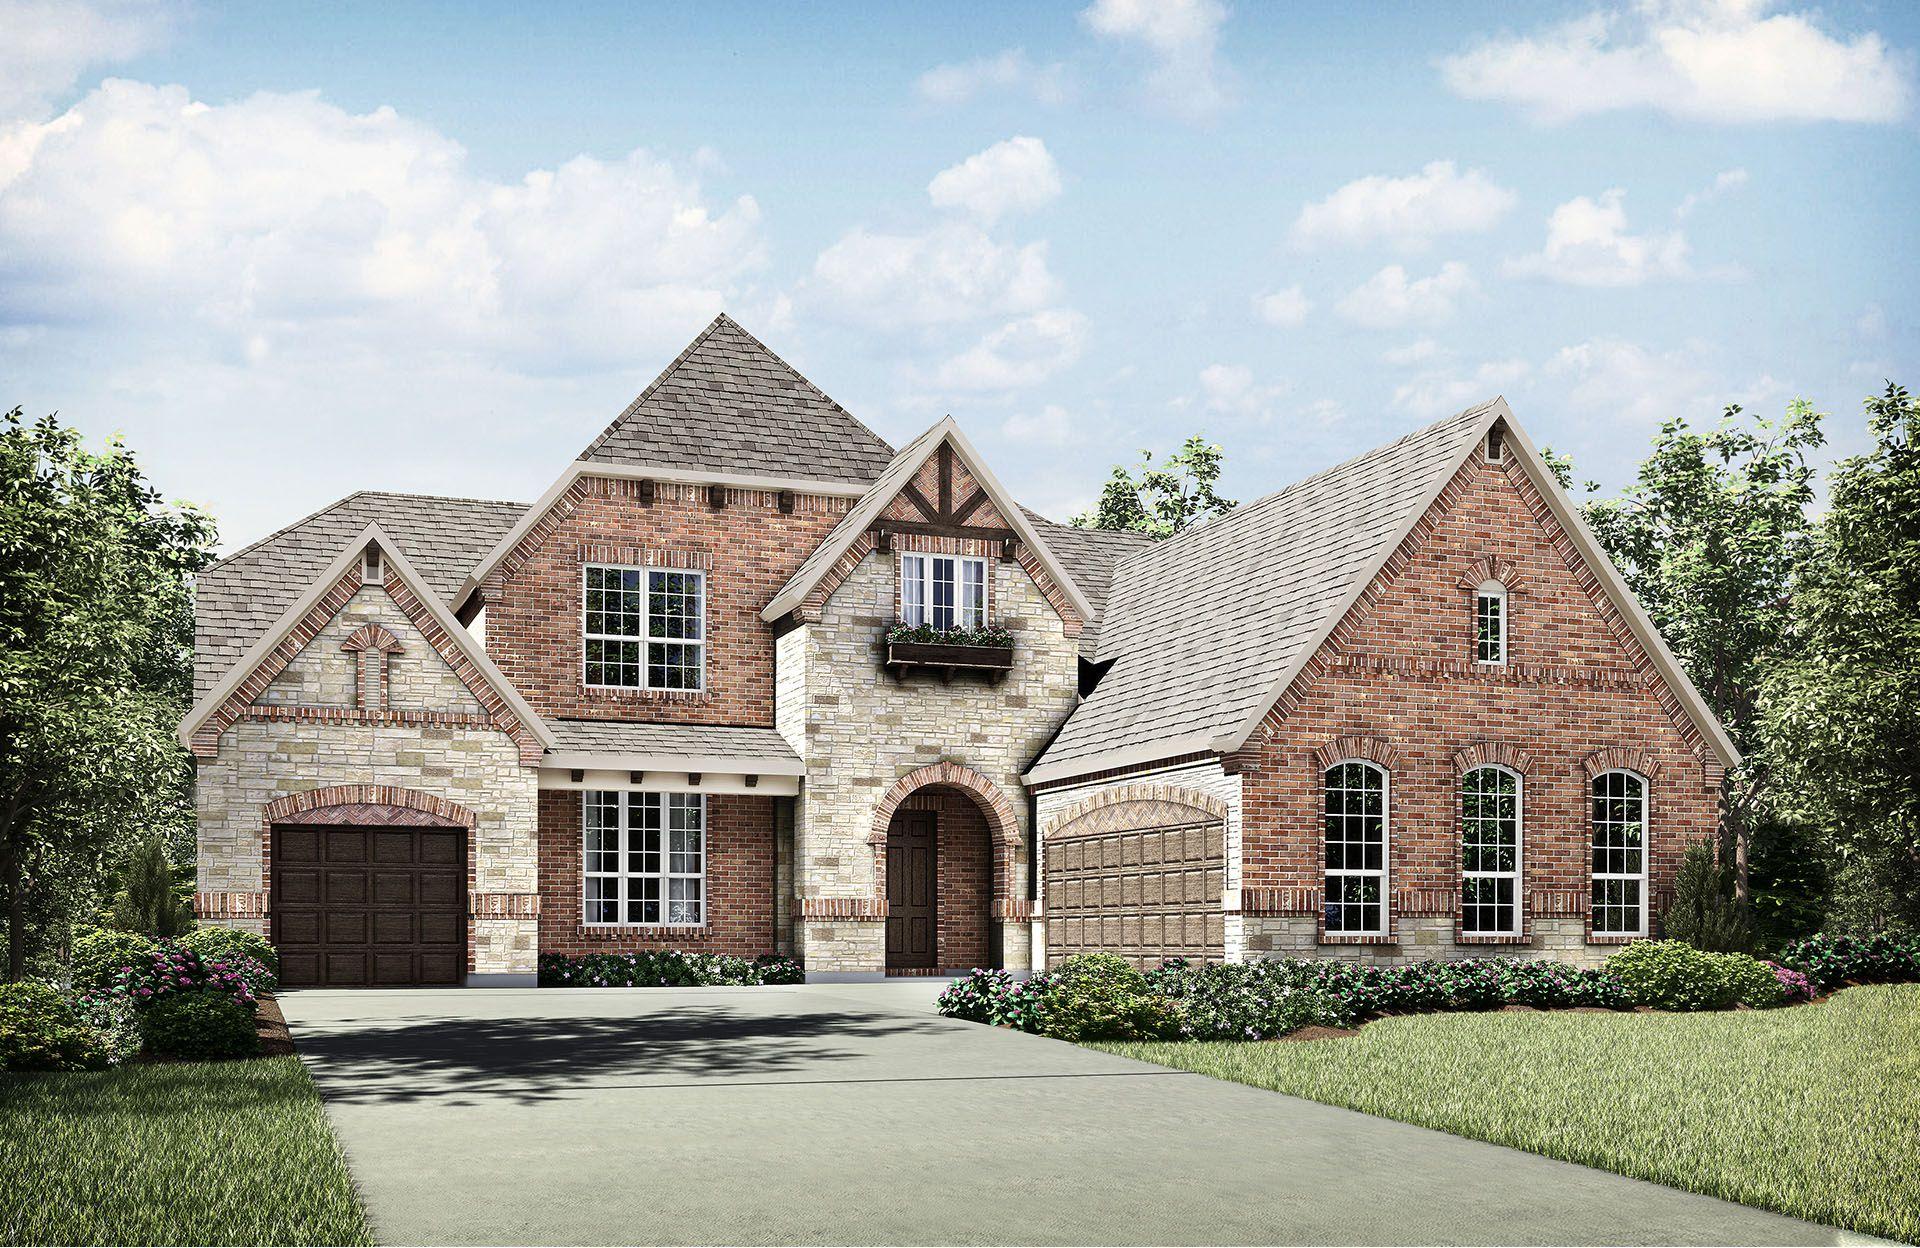 Single Family for Sale at Royal Brook At Kingwood - Brinkley 3306 Lockridge Harbor Lane Porter, Texas 77365 United States